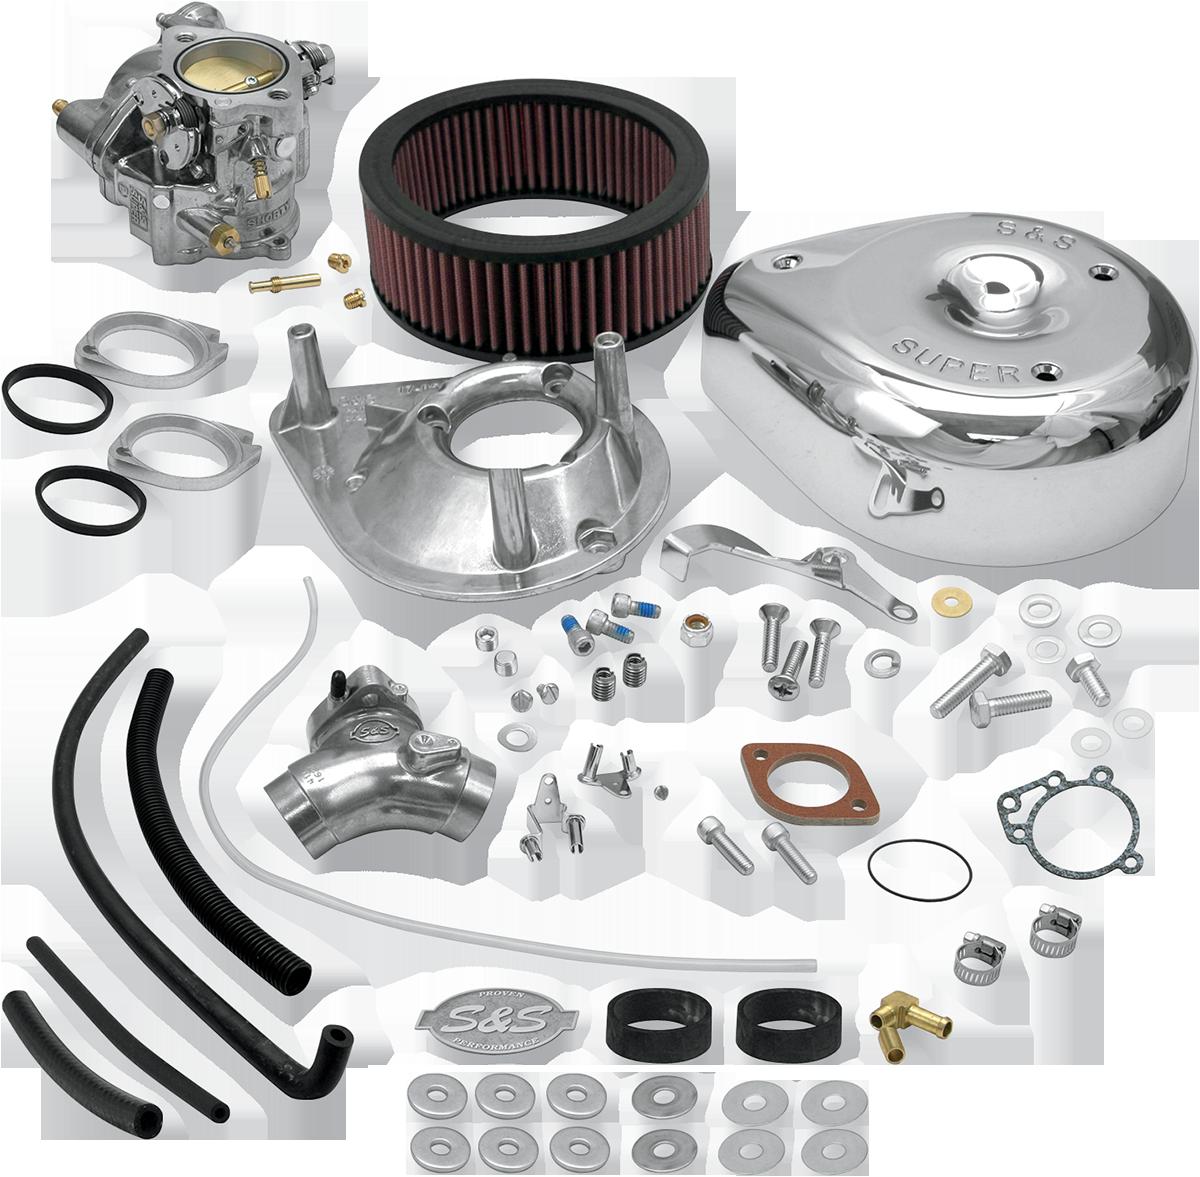 "S&S Super E 1 7/8"" Carburetor Manifold Kit for 84-91 Harley Dyna Touring Softail"